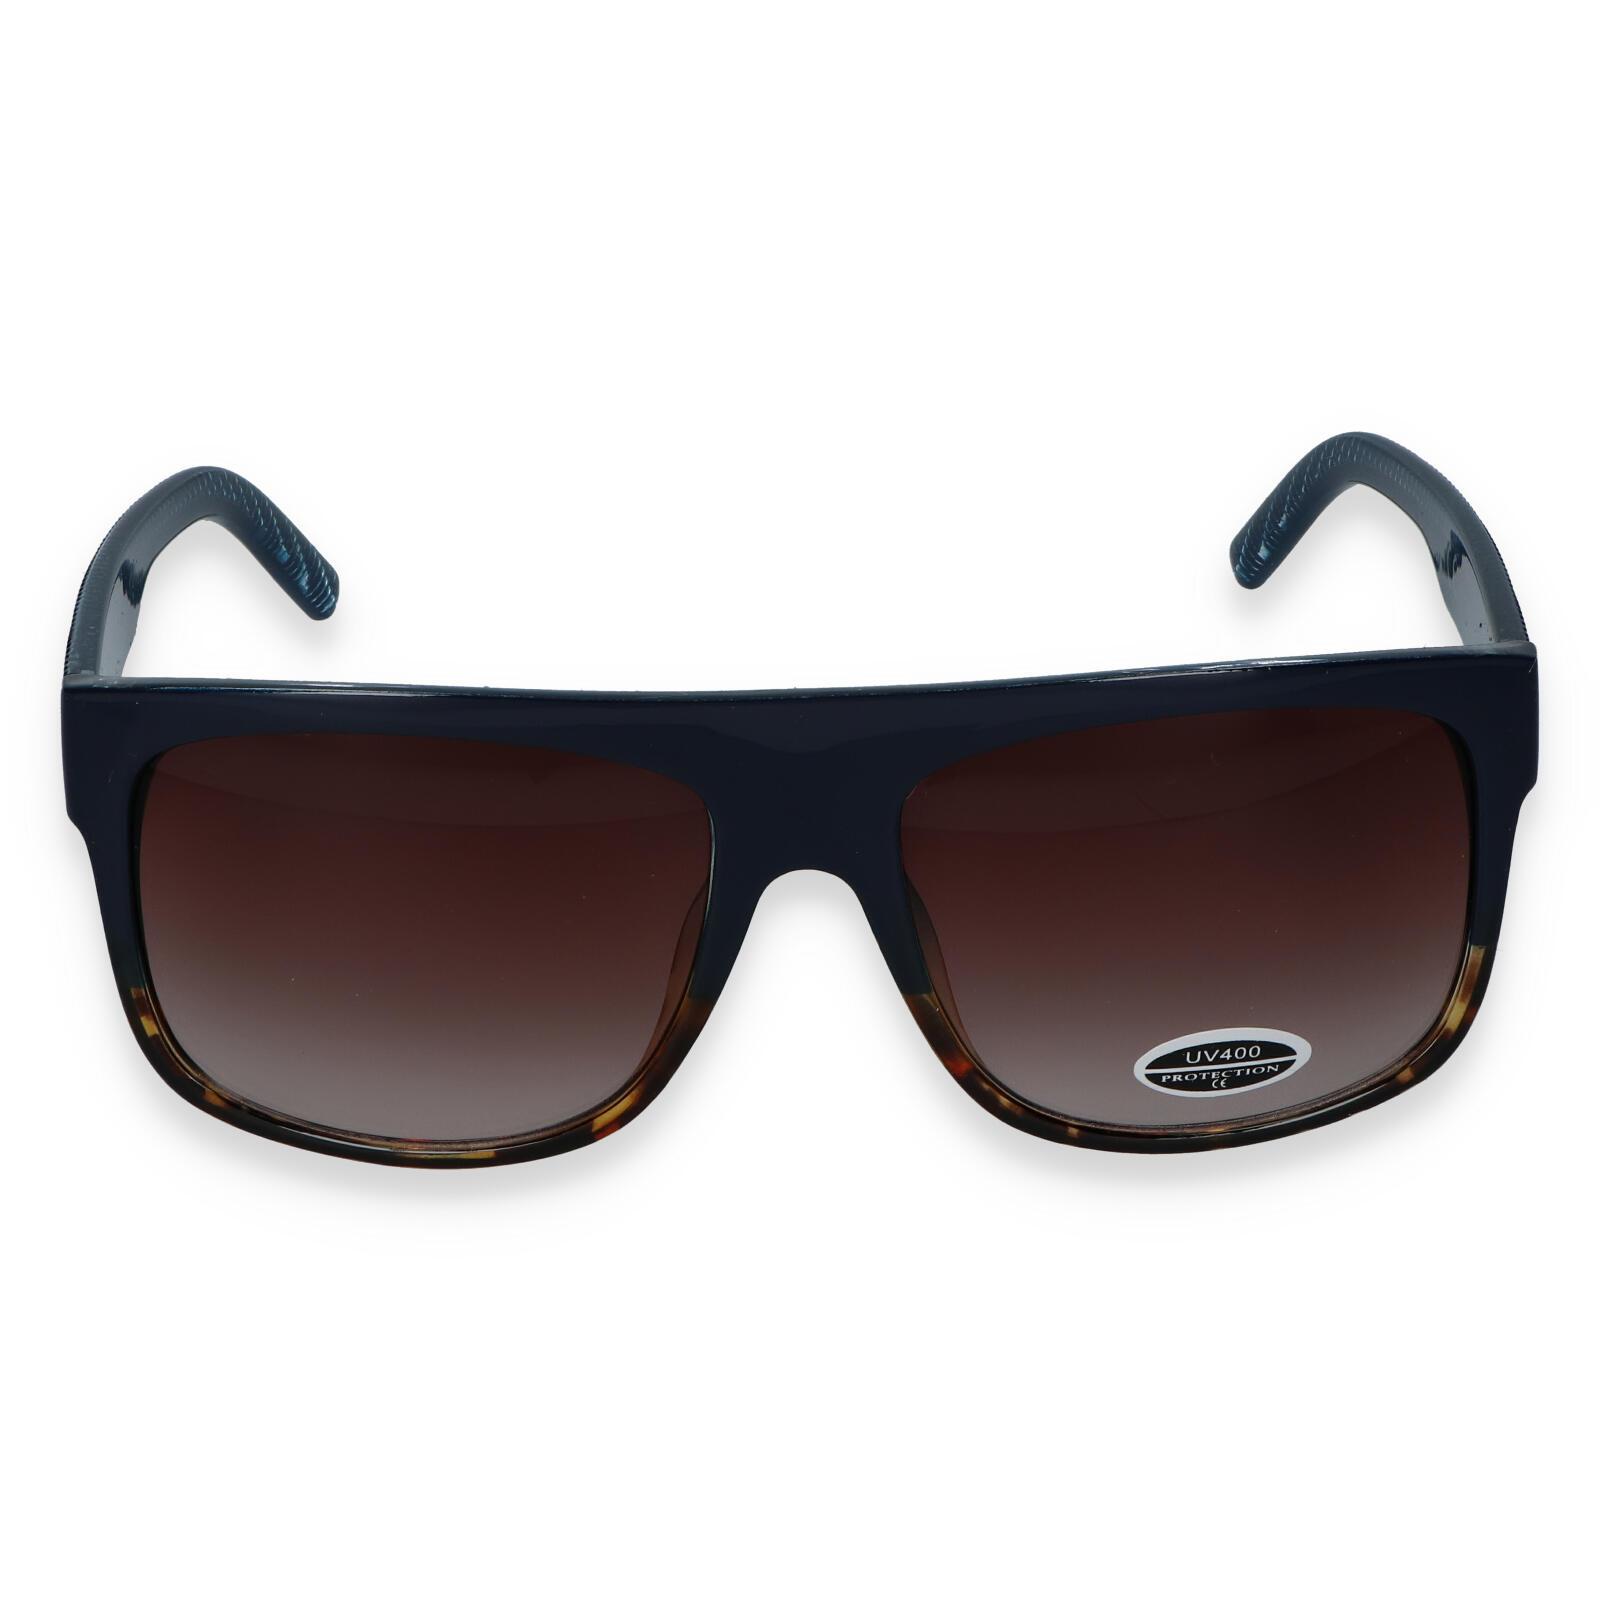 Dámske slnečné okuliare tmavomodré - S2103